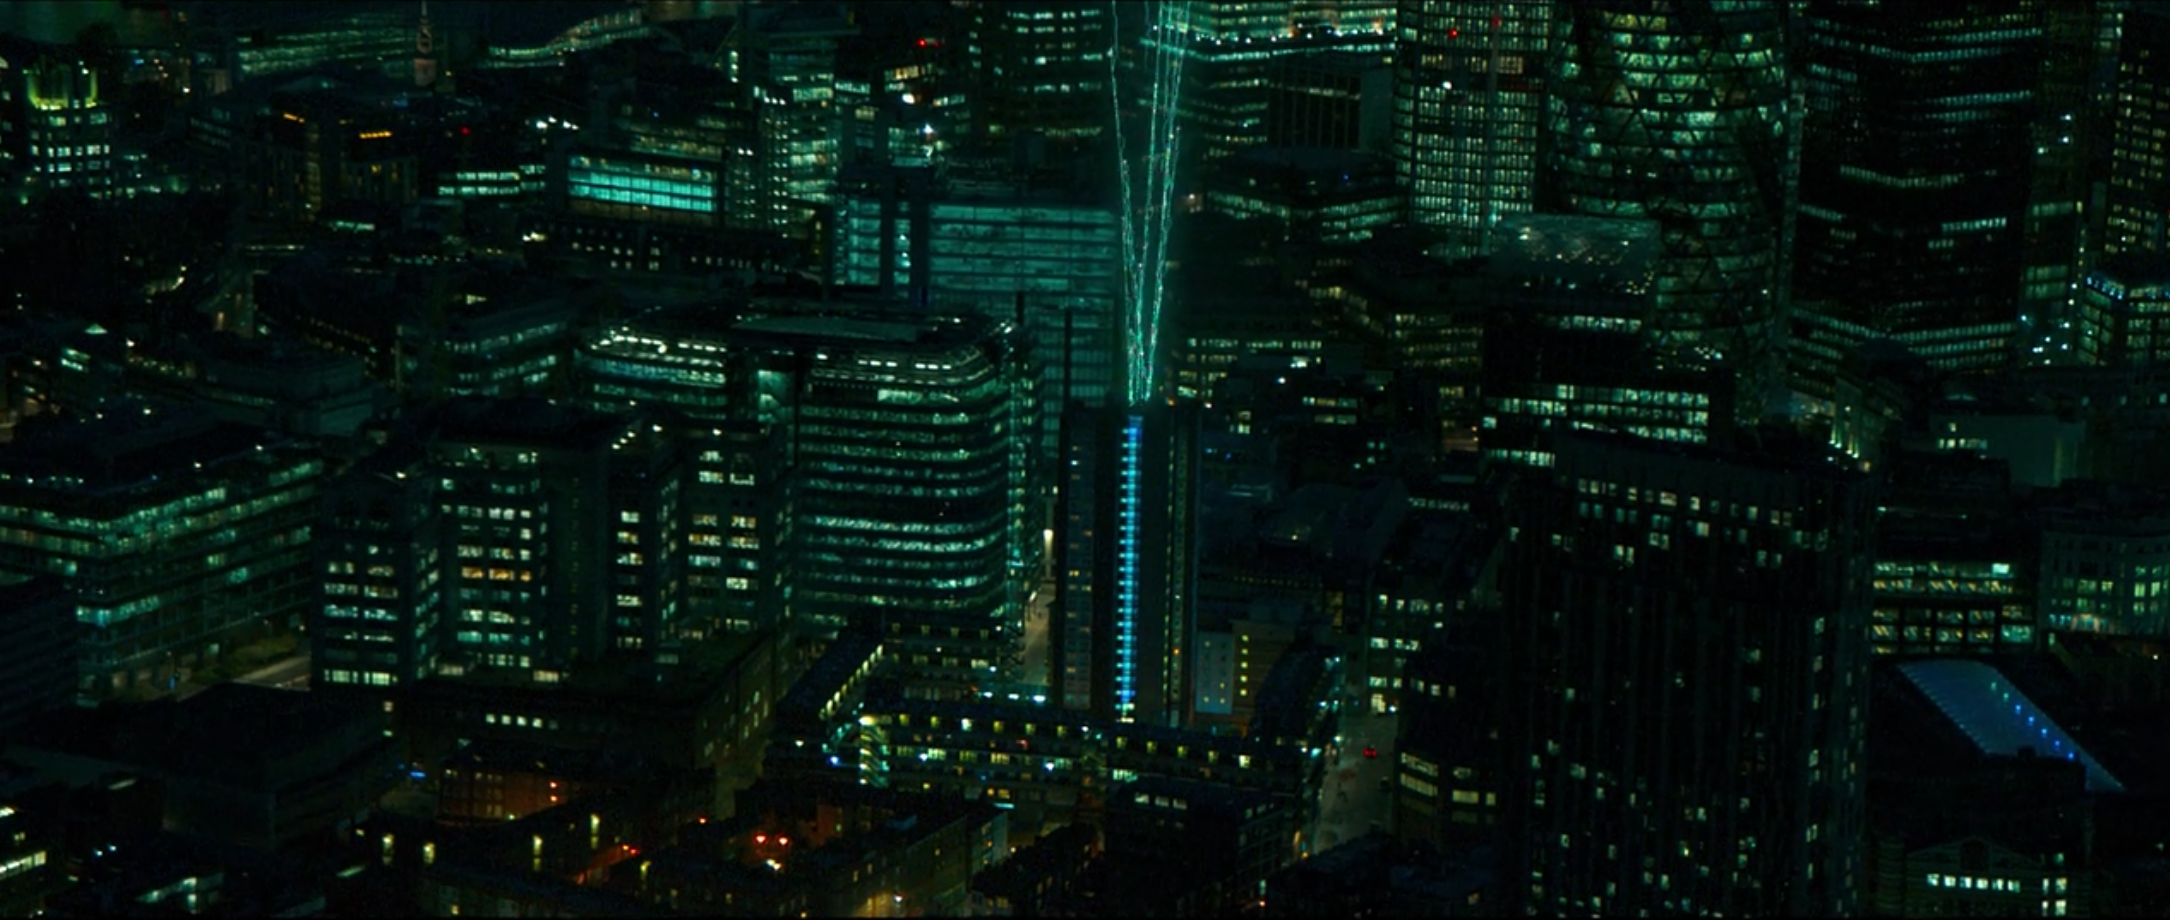 iBoy's tech cityscape